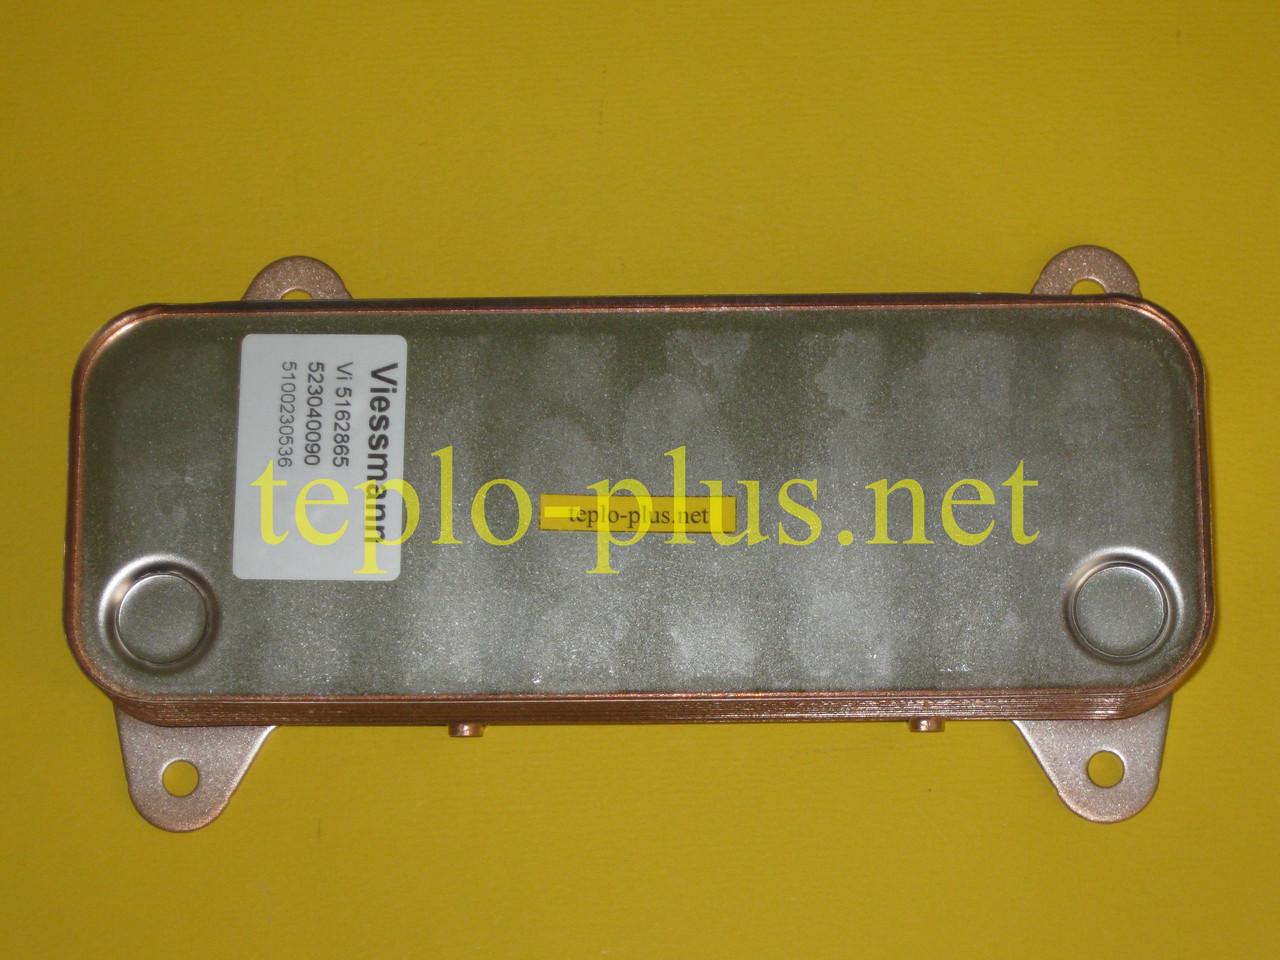 Теплообменник вторичный WHE 24 кВт, WH0 7817471 Viessmann Vitopend, Vitopend 100, фото 2